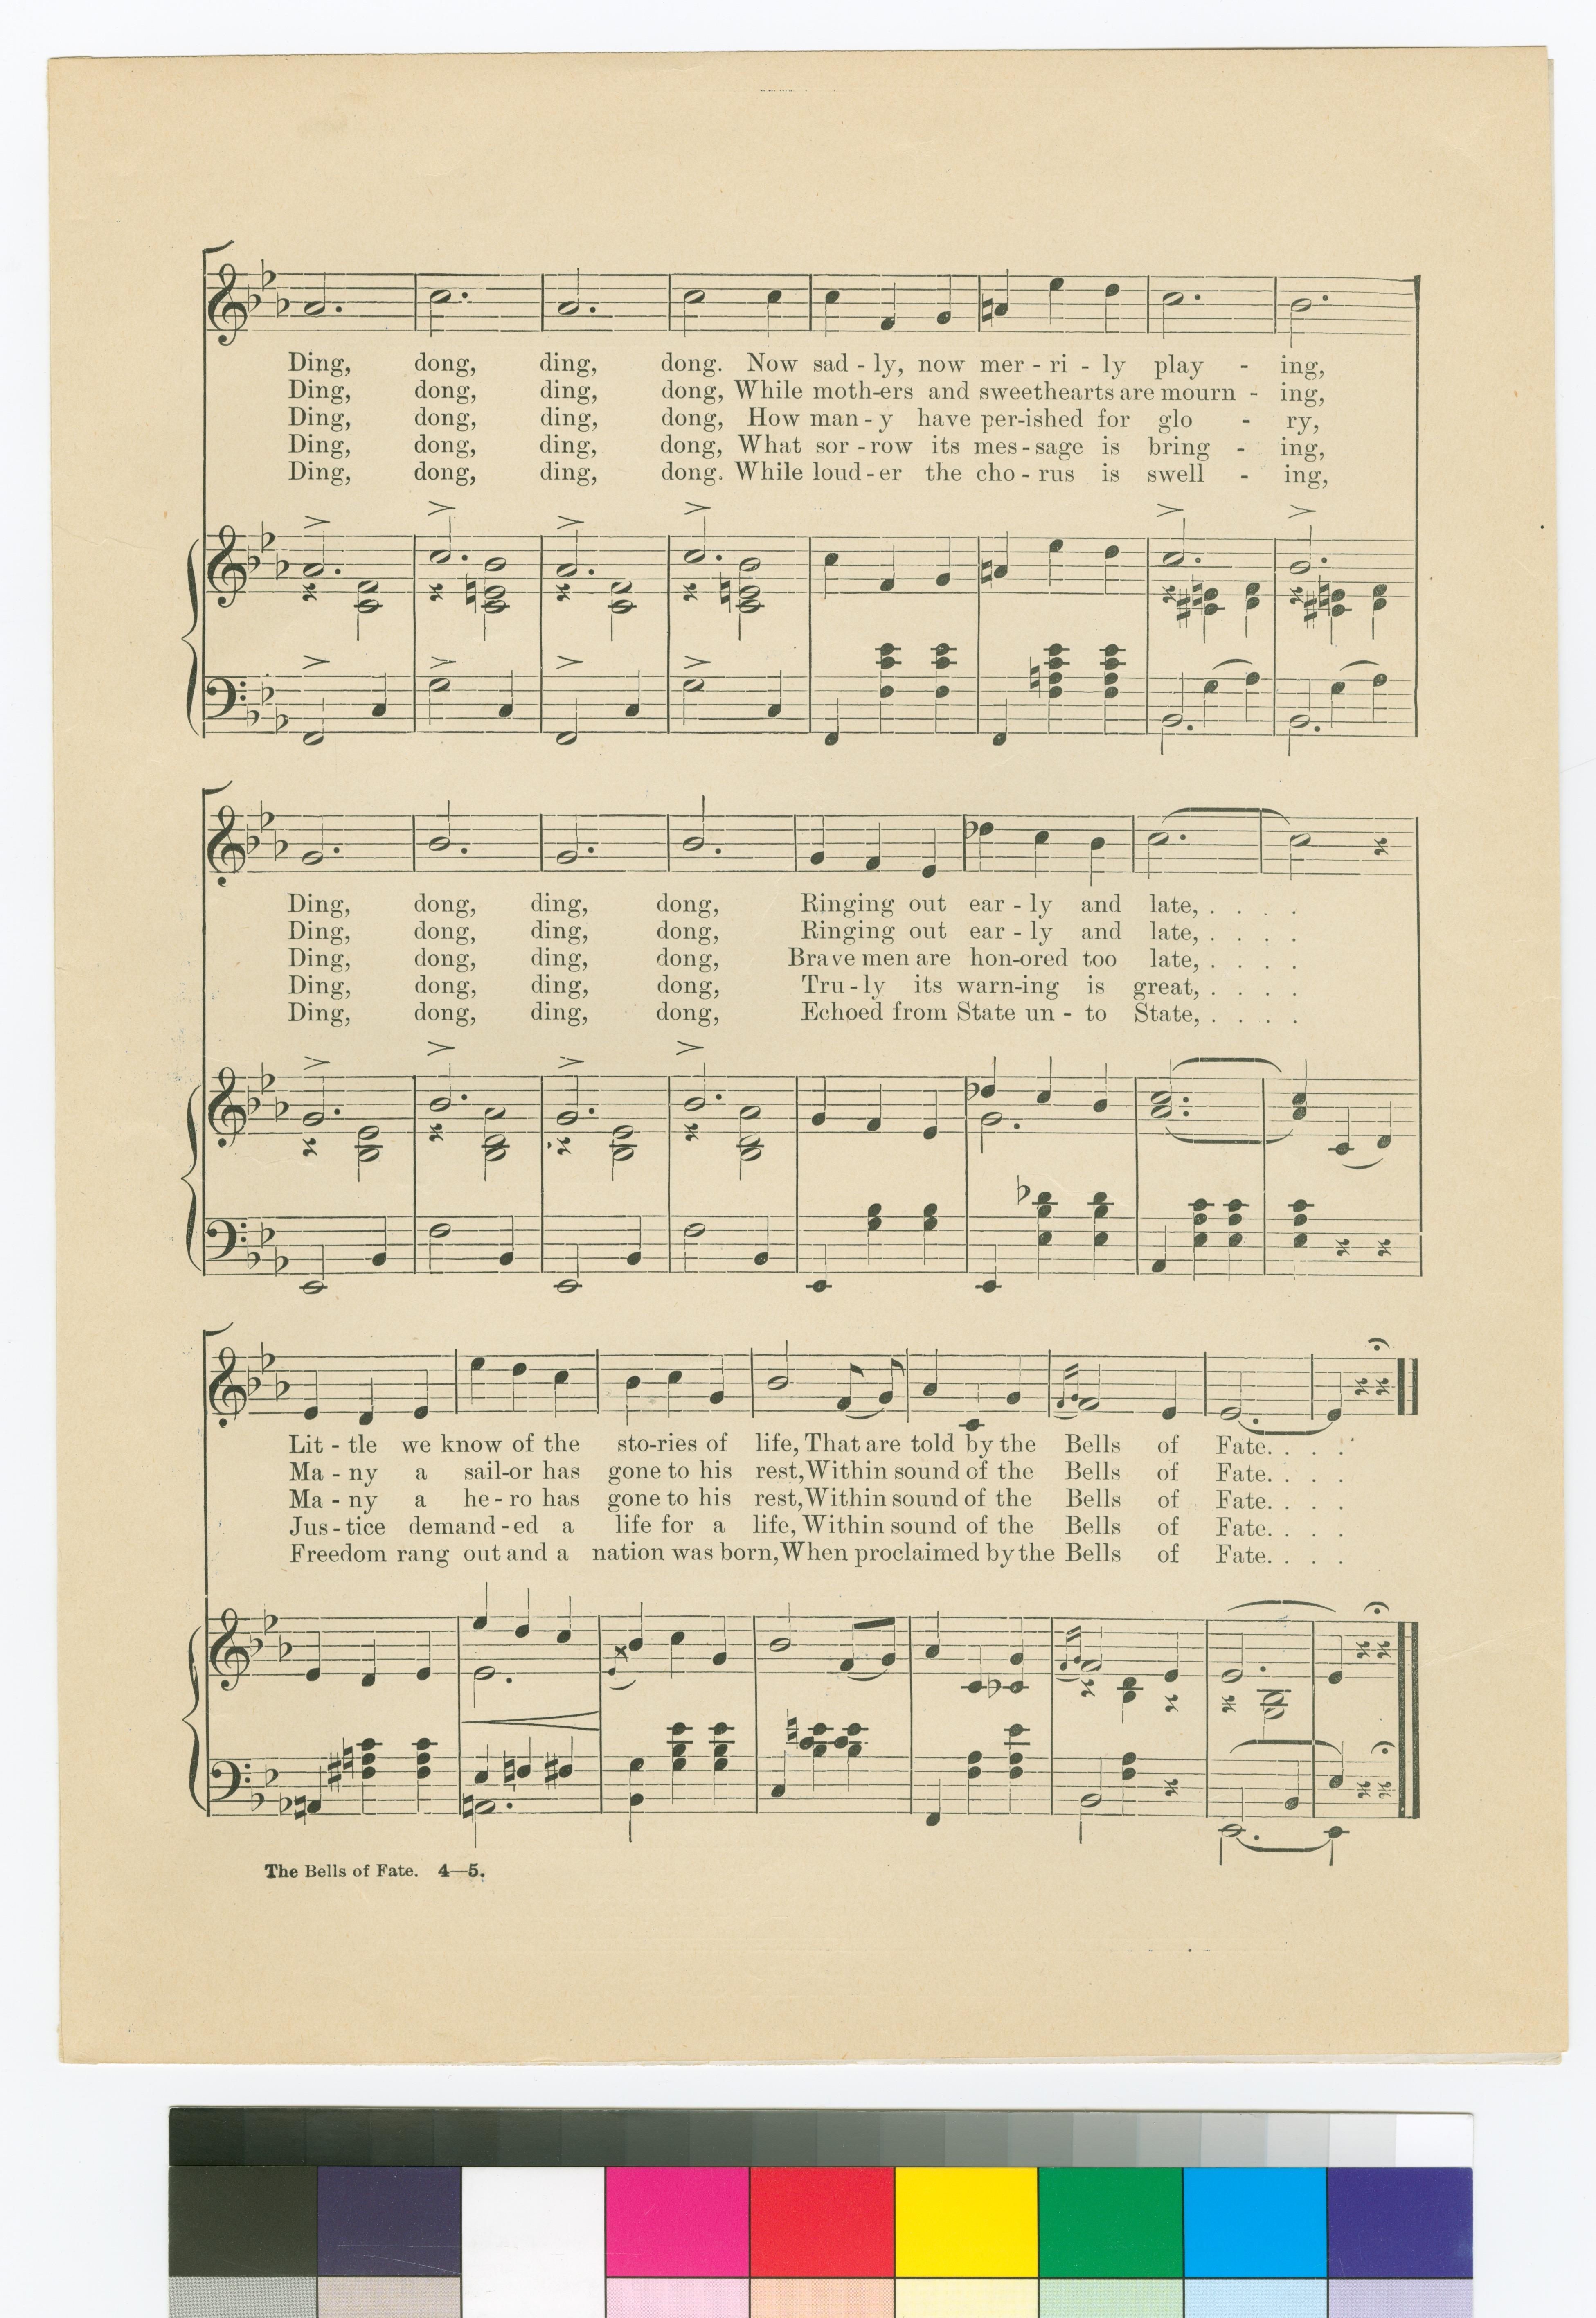 a055031113b File The bells of fate (NYPL Hades-454098-1699986).jpg - Wikimedia ...